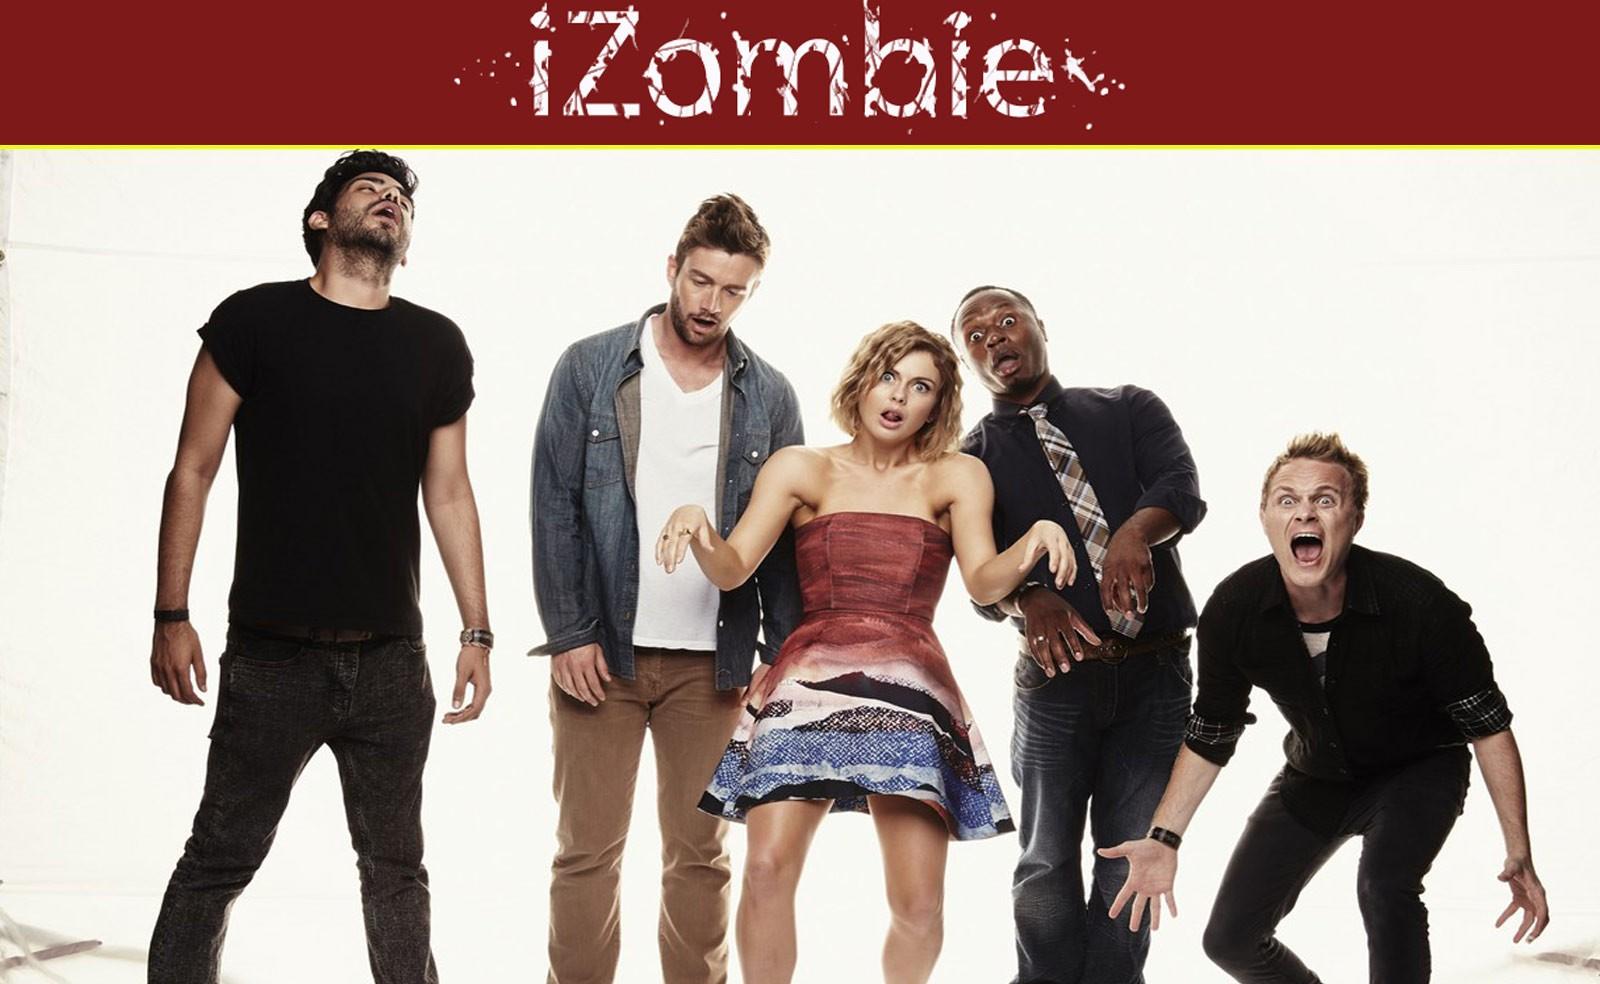 izombie-tv-show-cast-Wallpaper